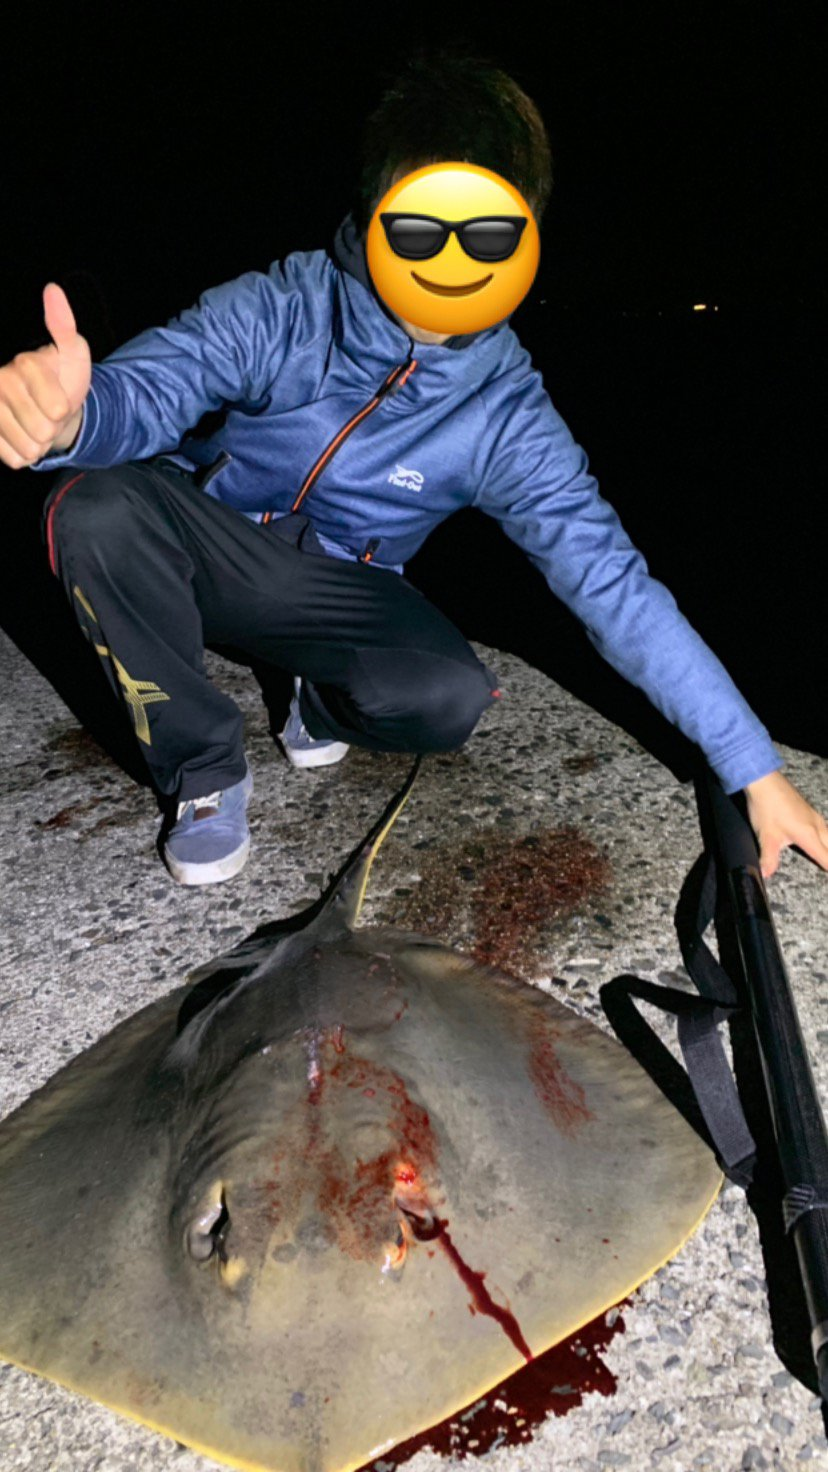 Fishingclubさんの投稿画像